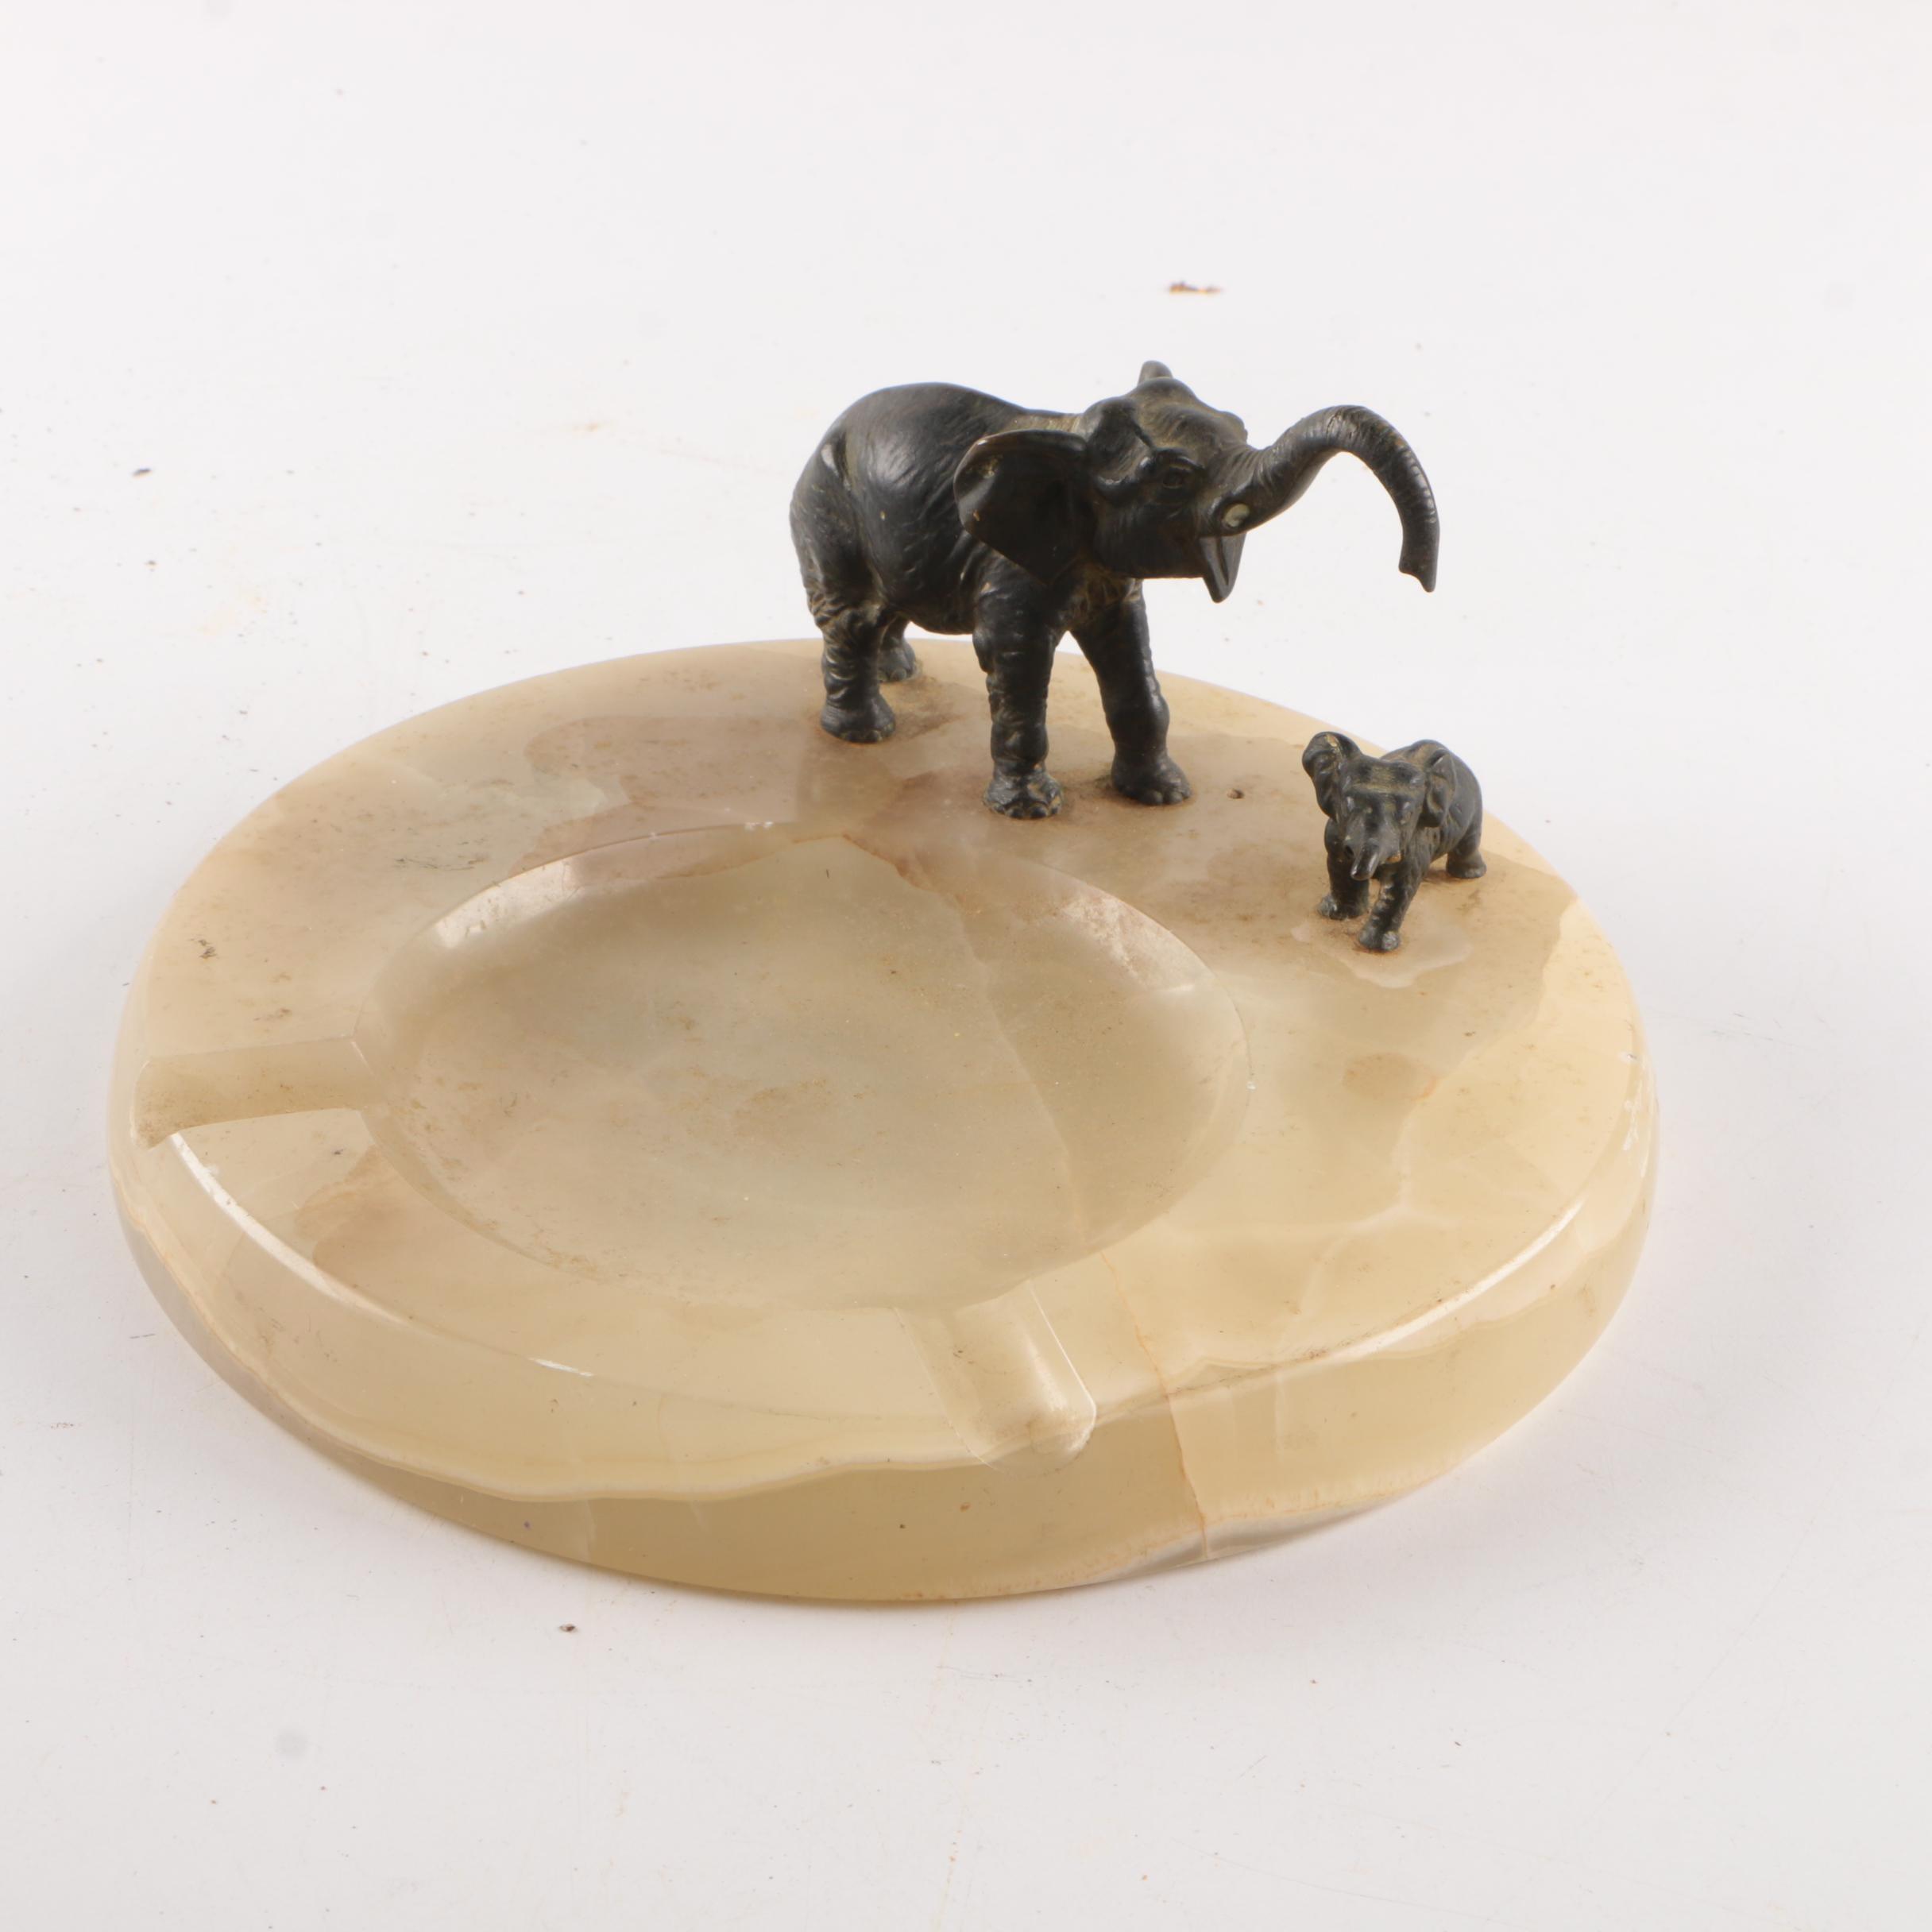 Calcite Ash Receiver Featuring Bronze Elephants